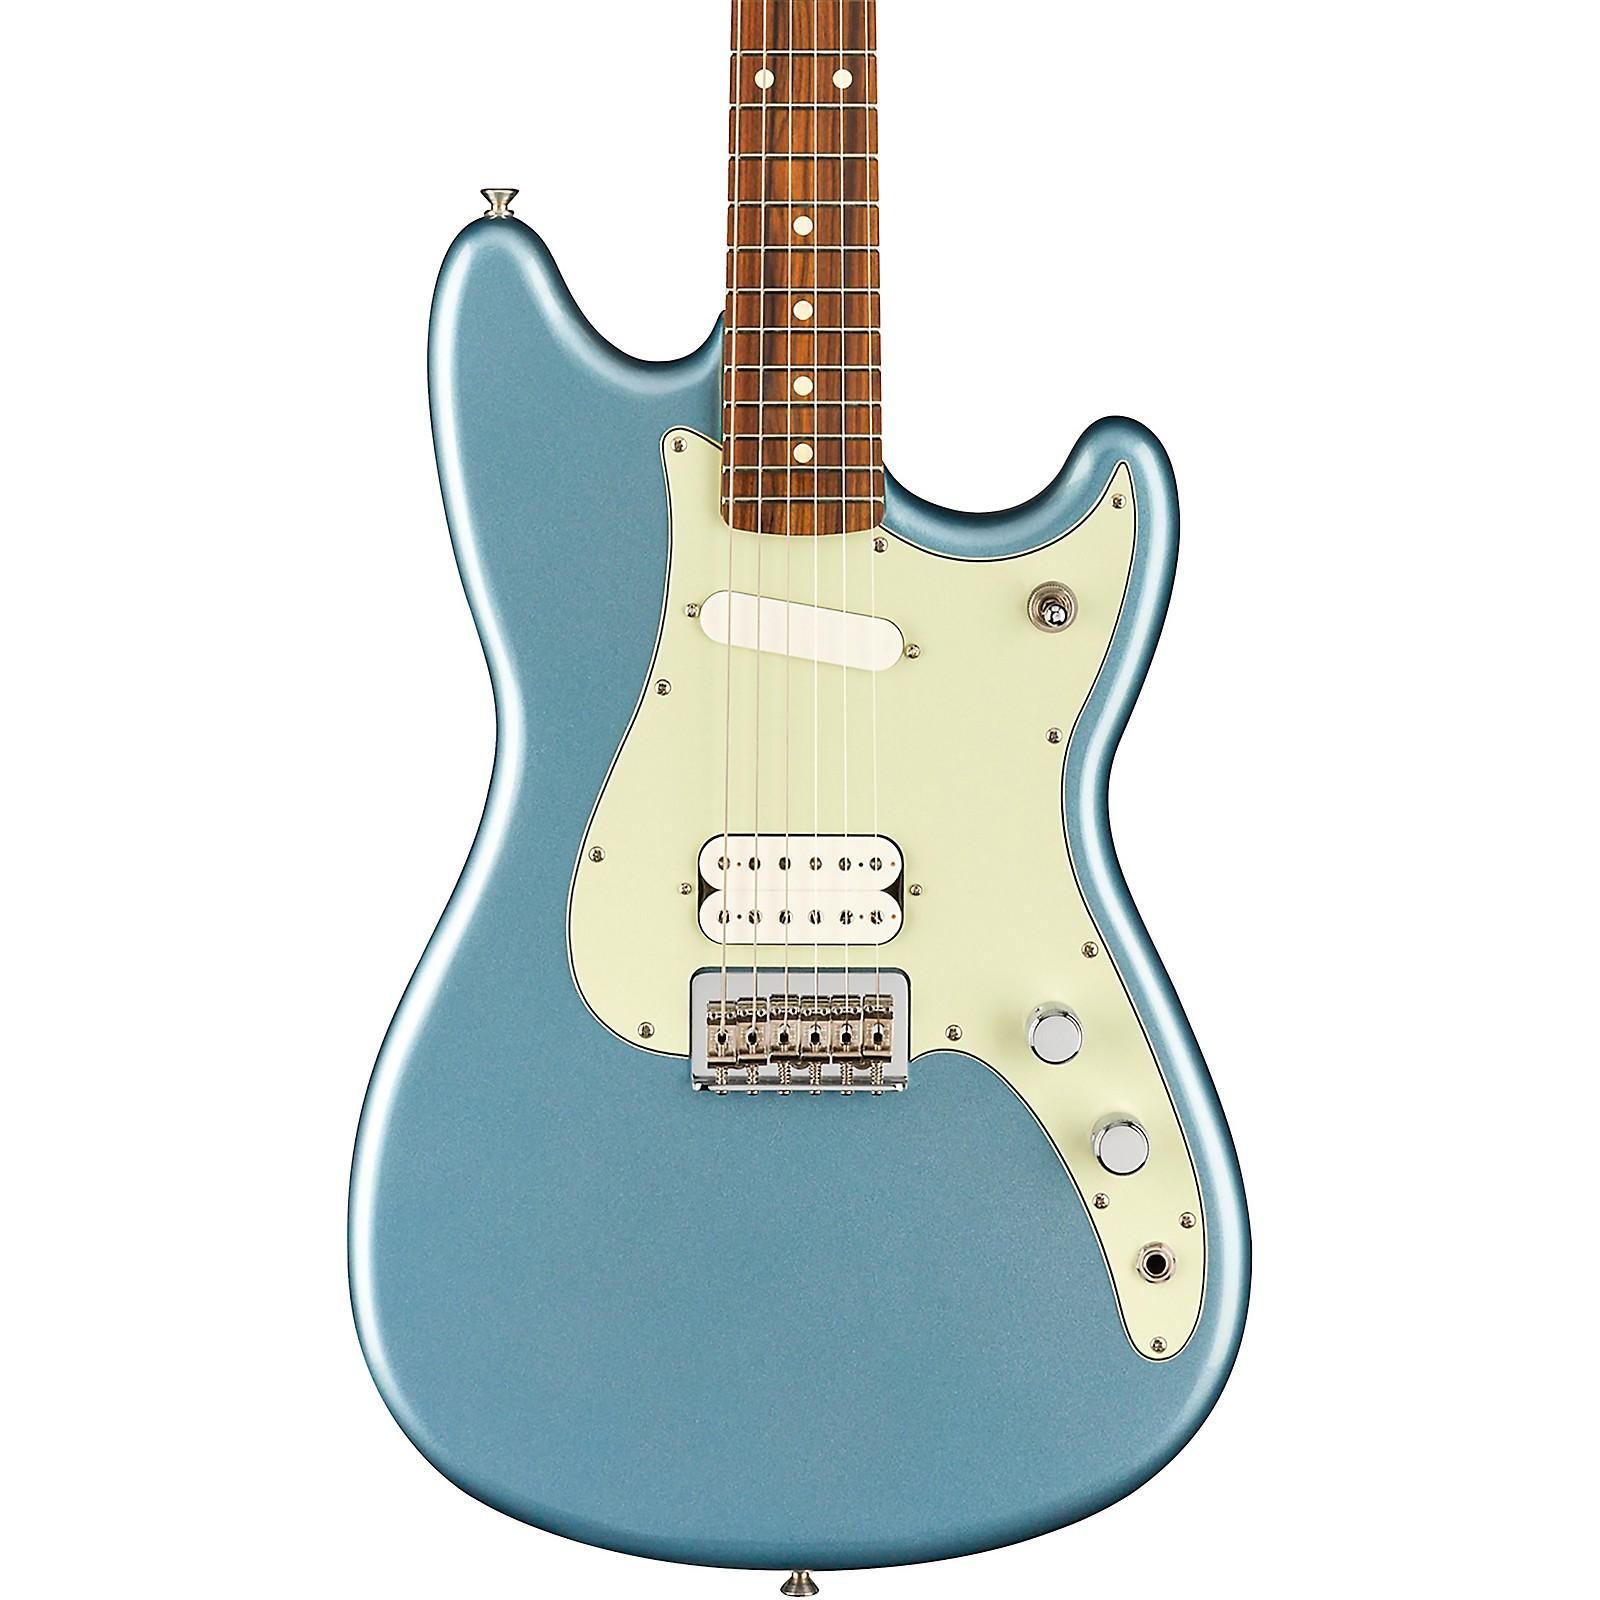 Fender Player Duo-Sonic HS Pau Ferro Fingerboard Electric Guitar